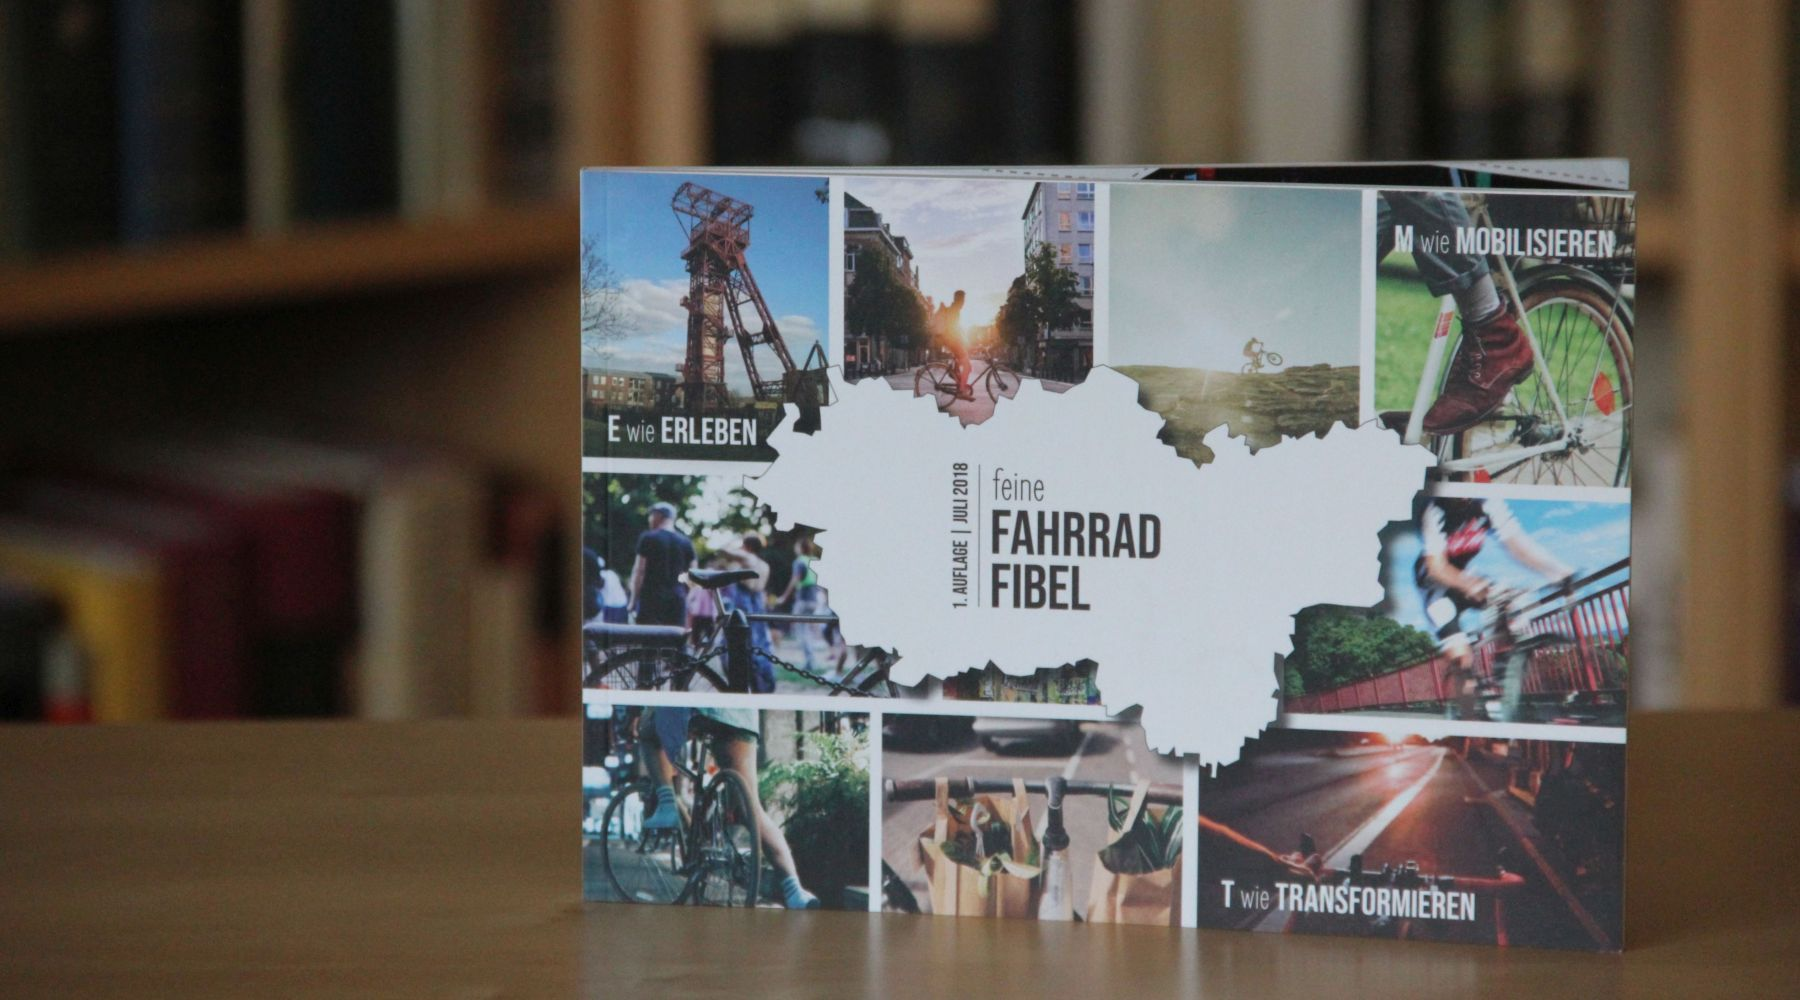 FeineFahrradFibel, Cover